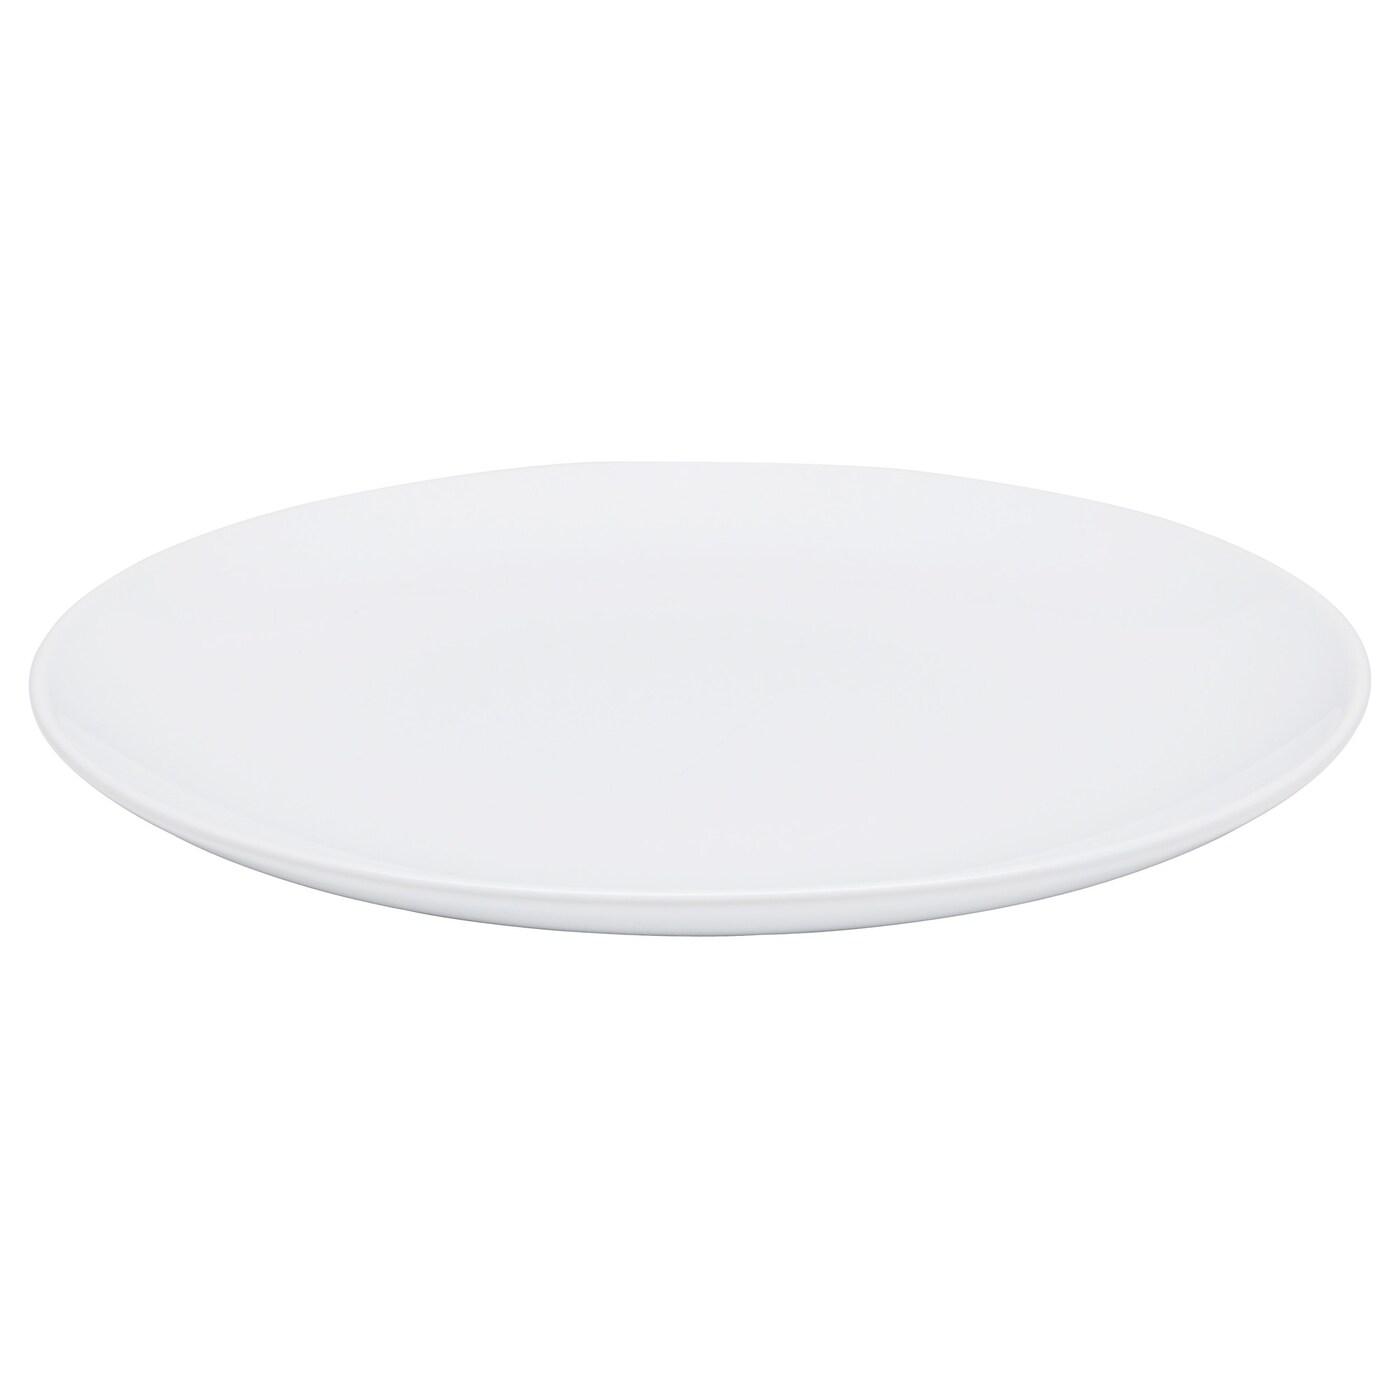 FRGRIK Plate Whitestoneware 27 Cm IKEA